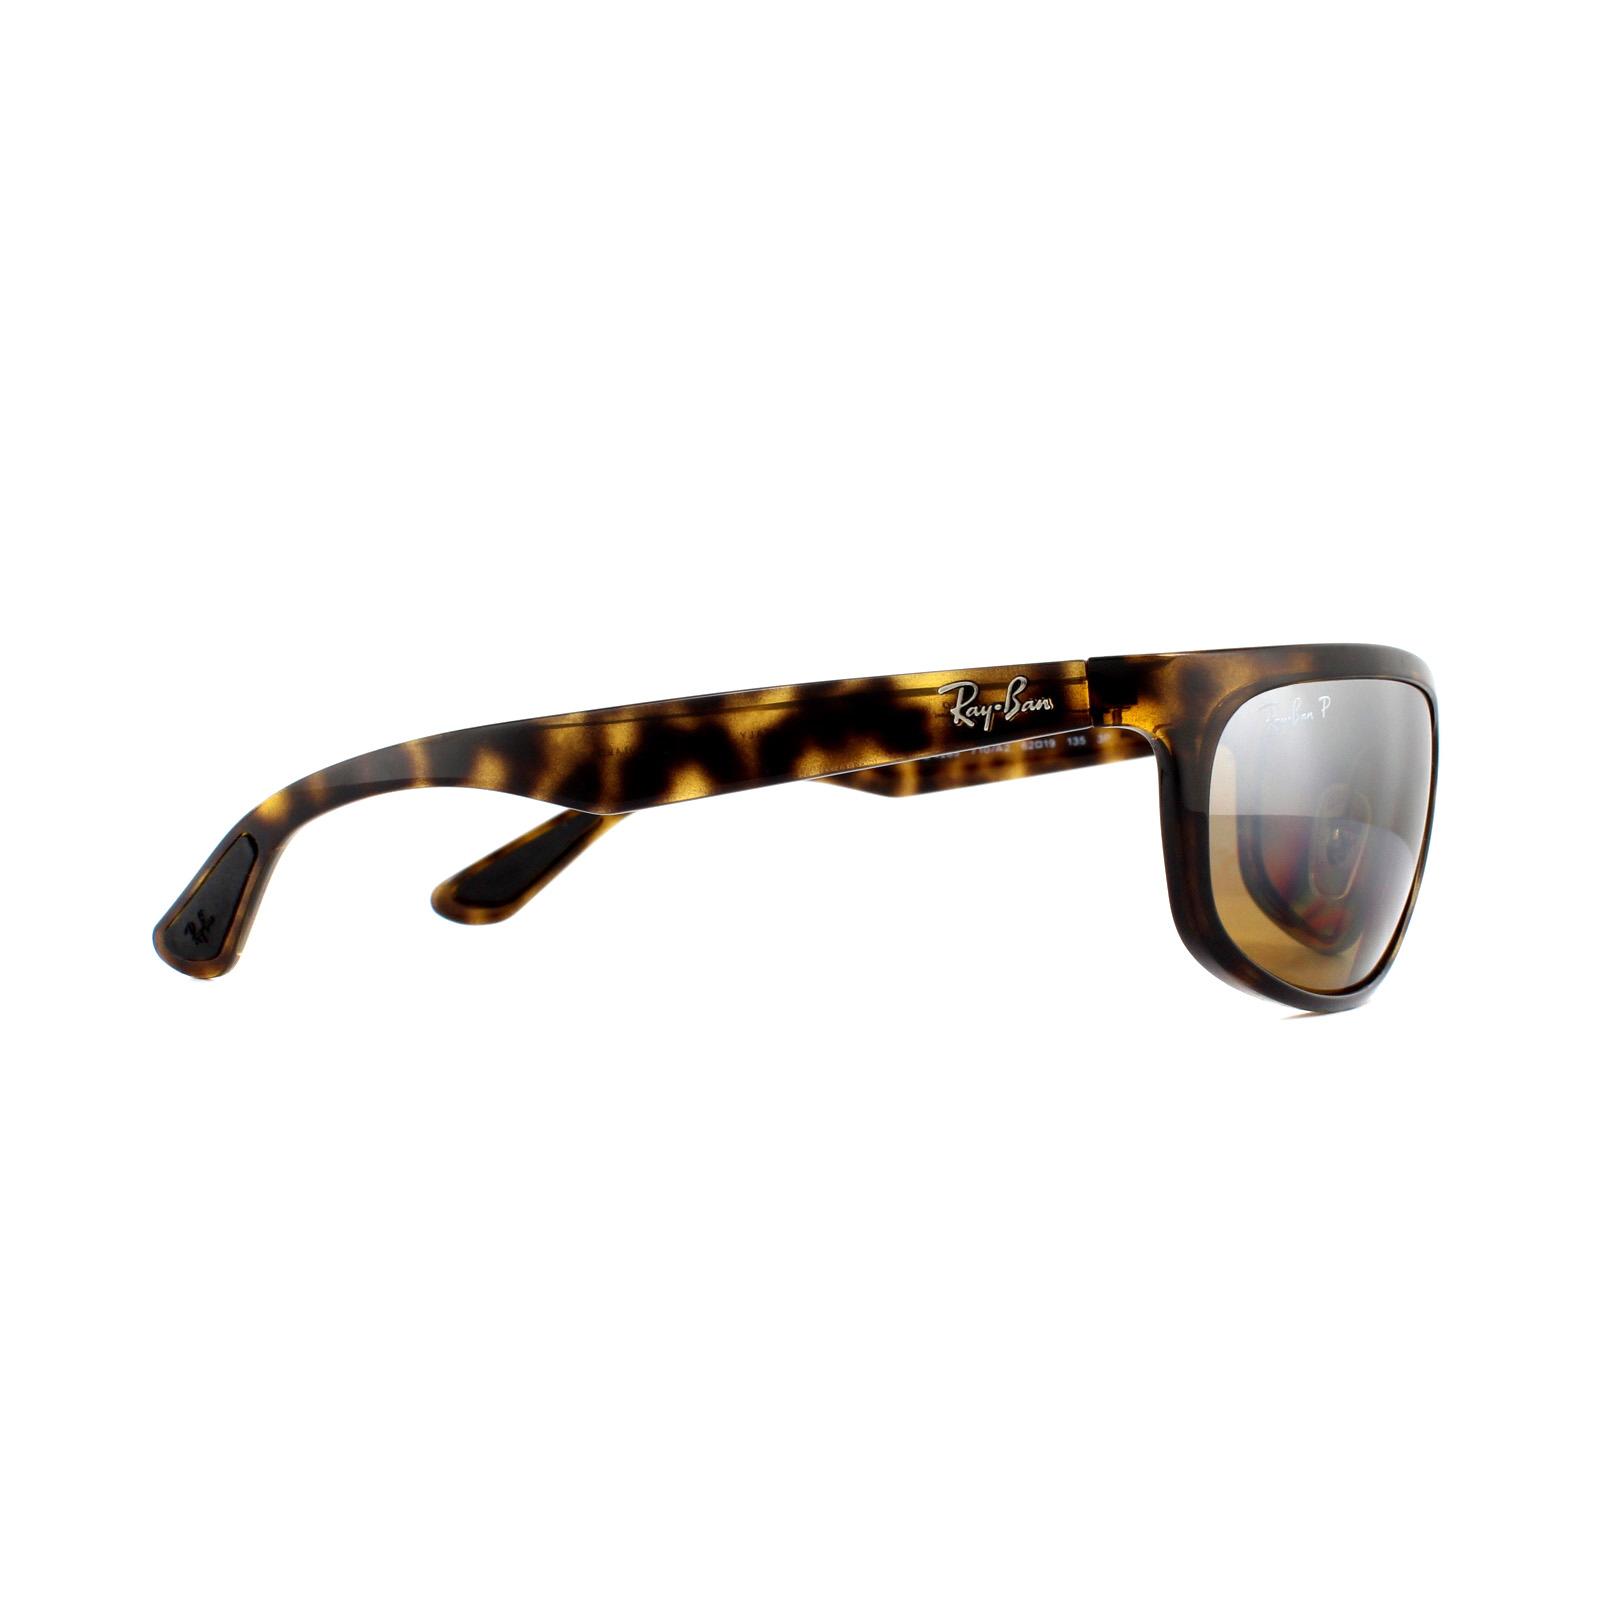 d09bb30ded ... Ray-Ban RB4265 Chromance Sunglasses Thumbnail 5